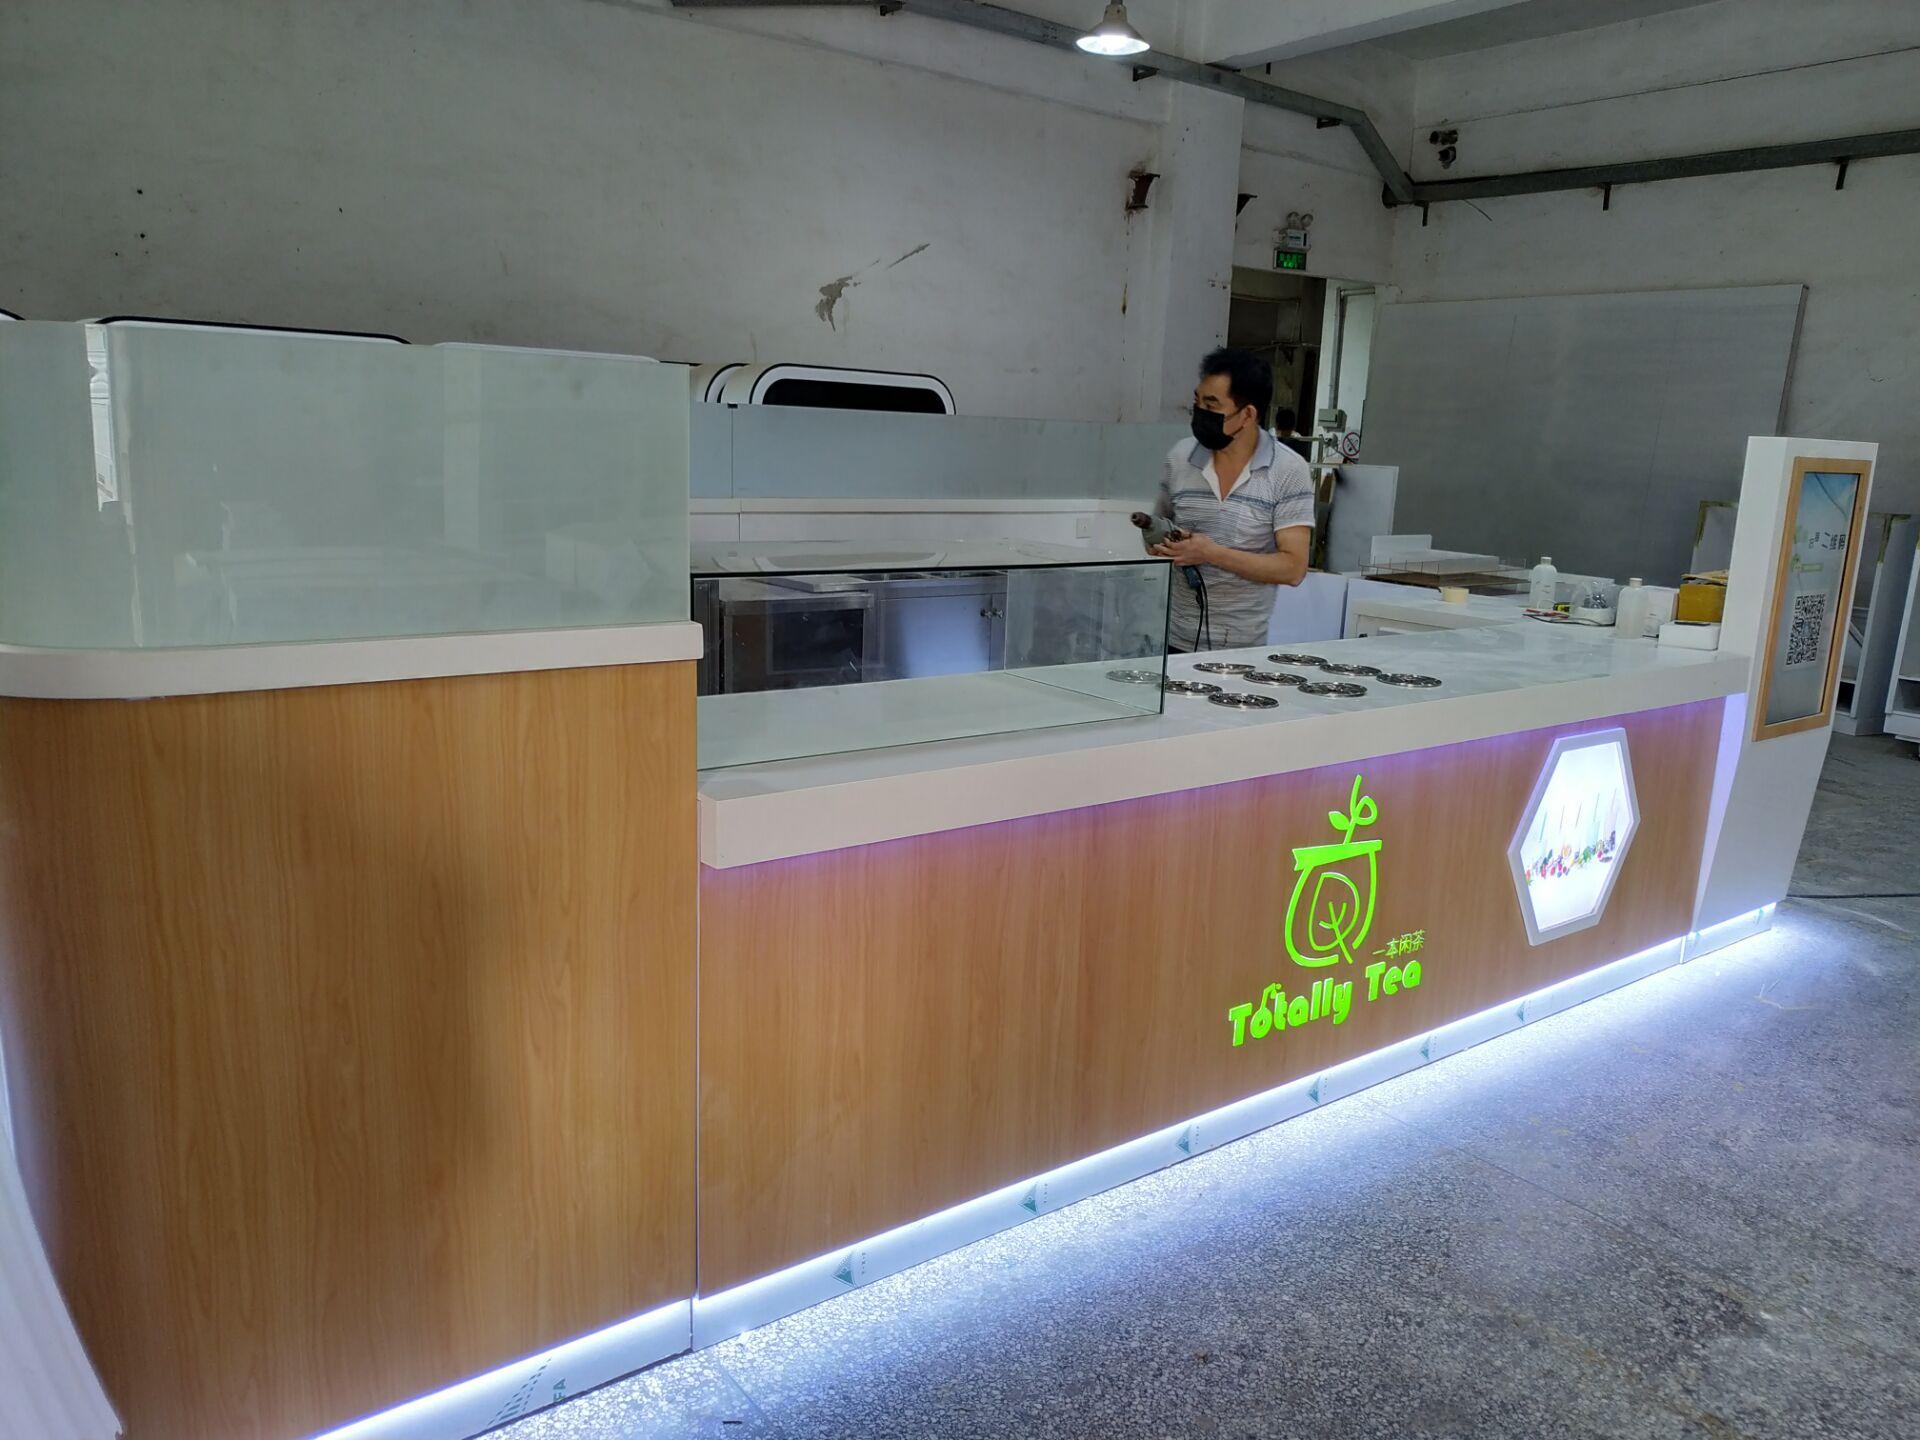 Milk tea kiosk production picture